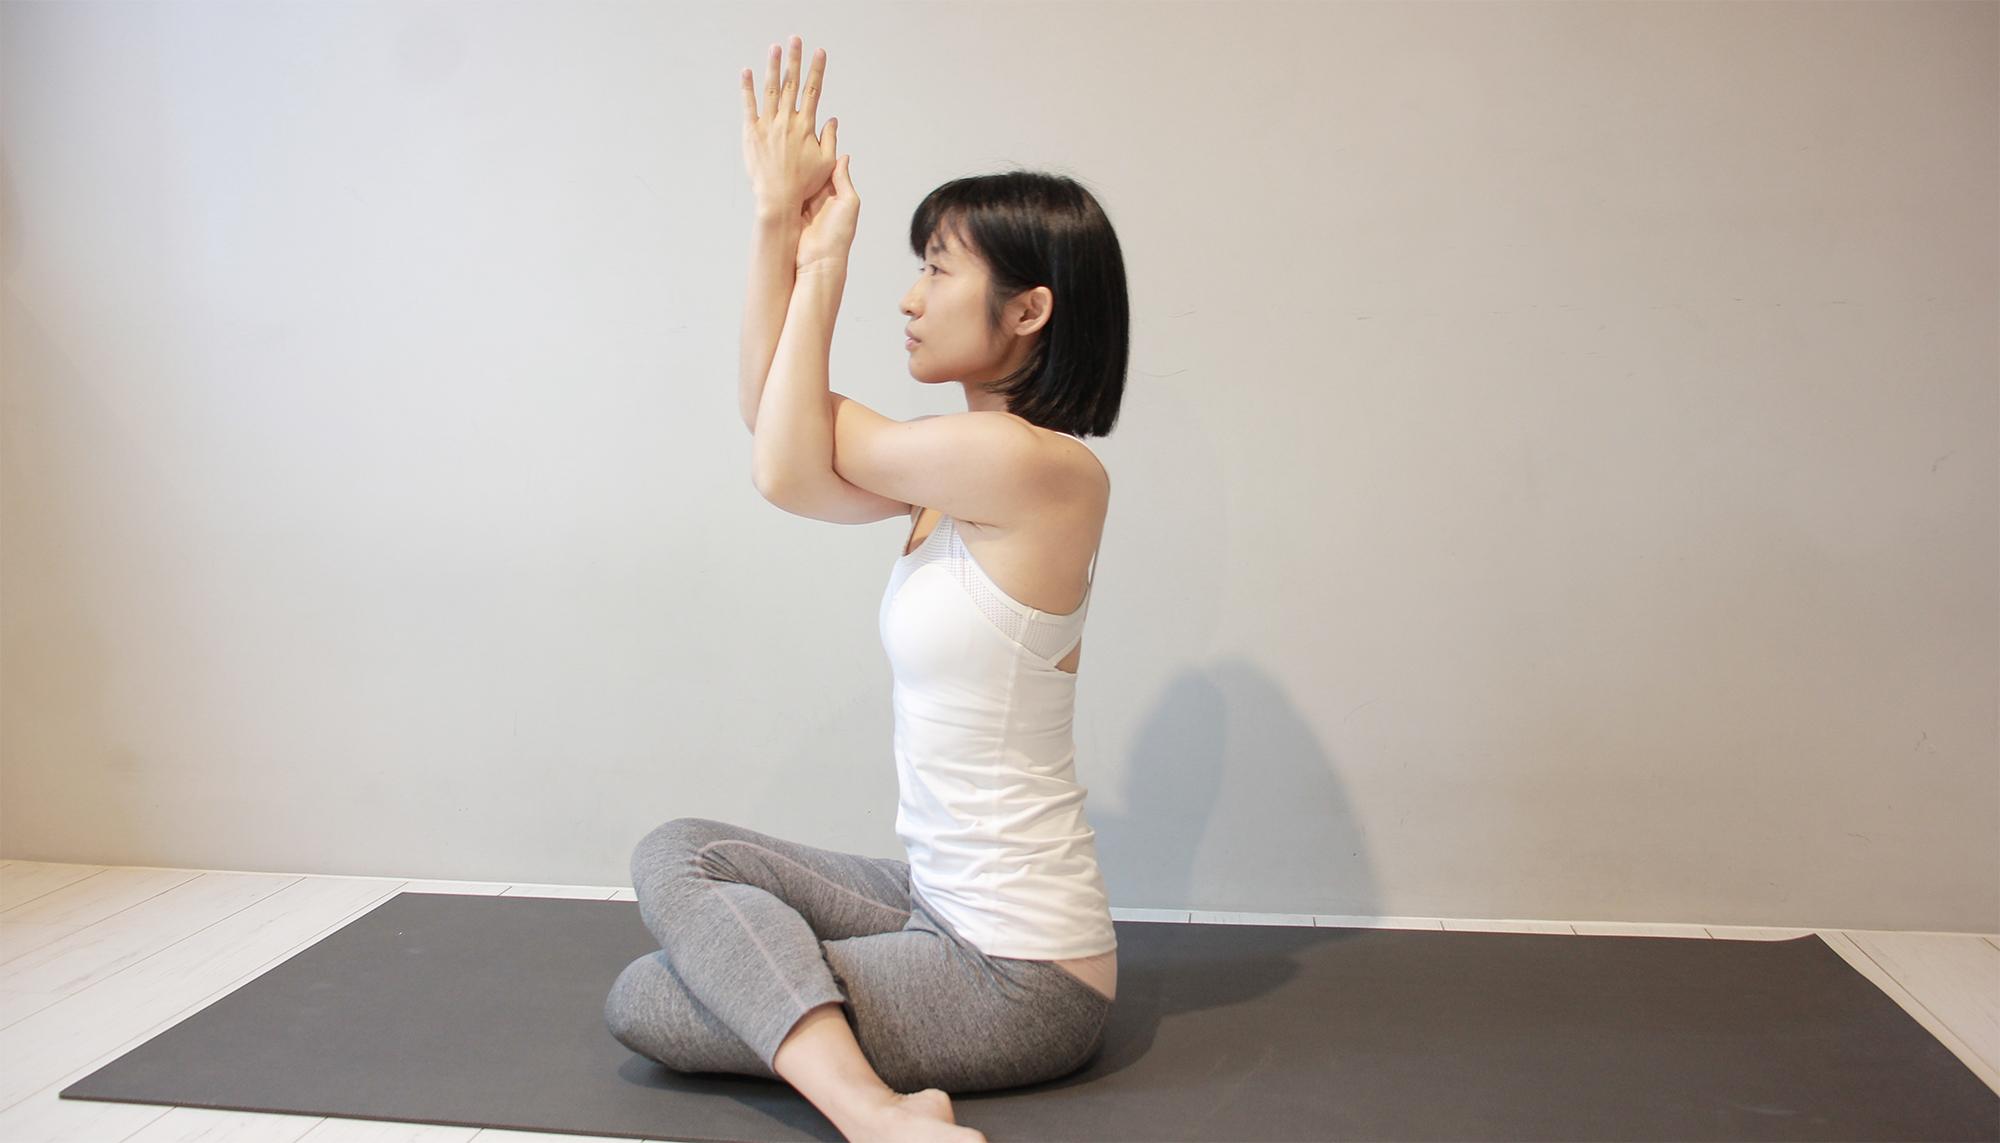 Yoga Teacher – Farah<br /><p>瑜珈幫助我找到內心與外在的合諧,在分享瑜珈的道路上,每一位學生就像是自己的一面鏡子,教學上喜歡透過柔和流暢的動作,也強調紮實的基礎訓練。</p>